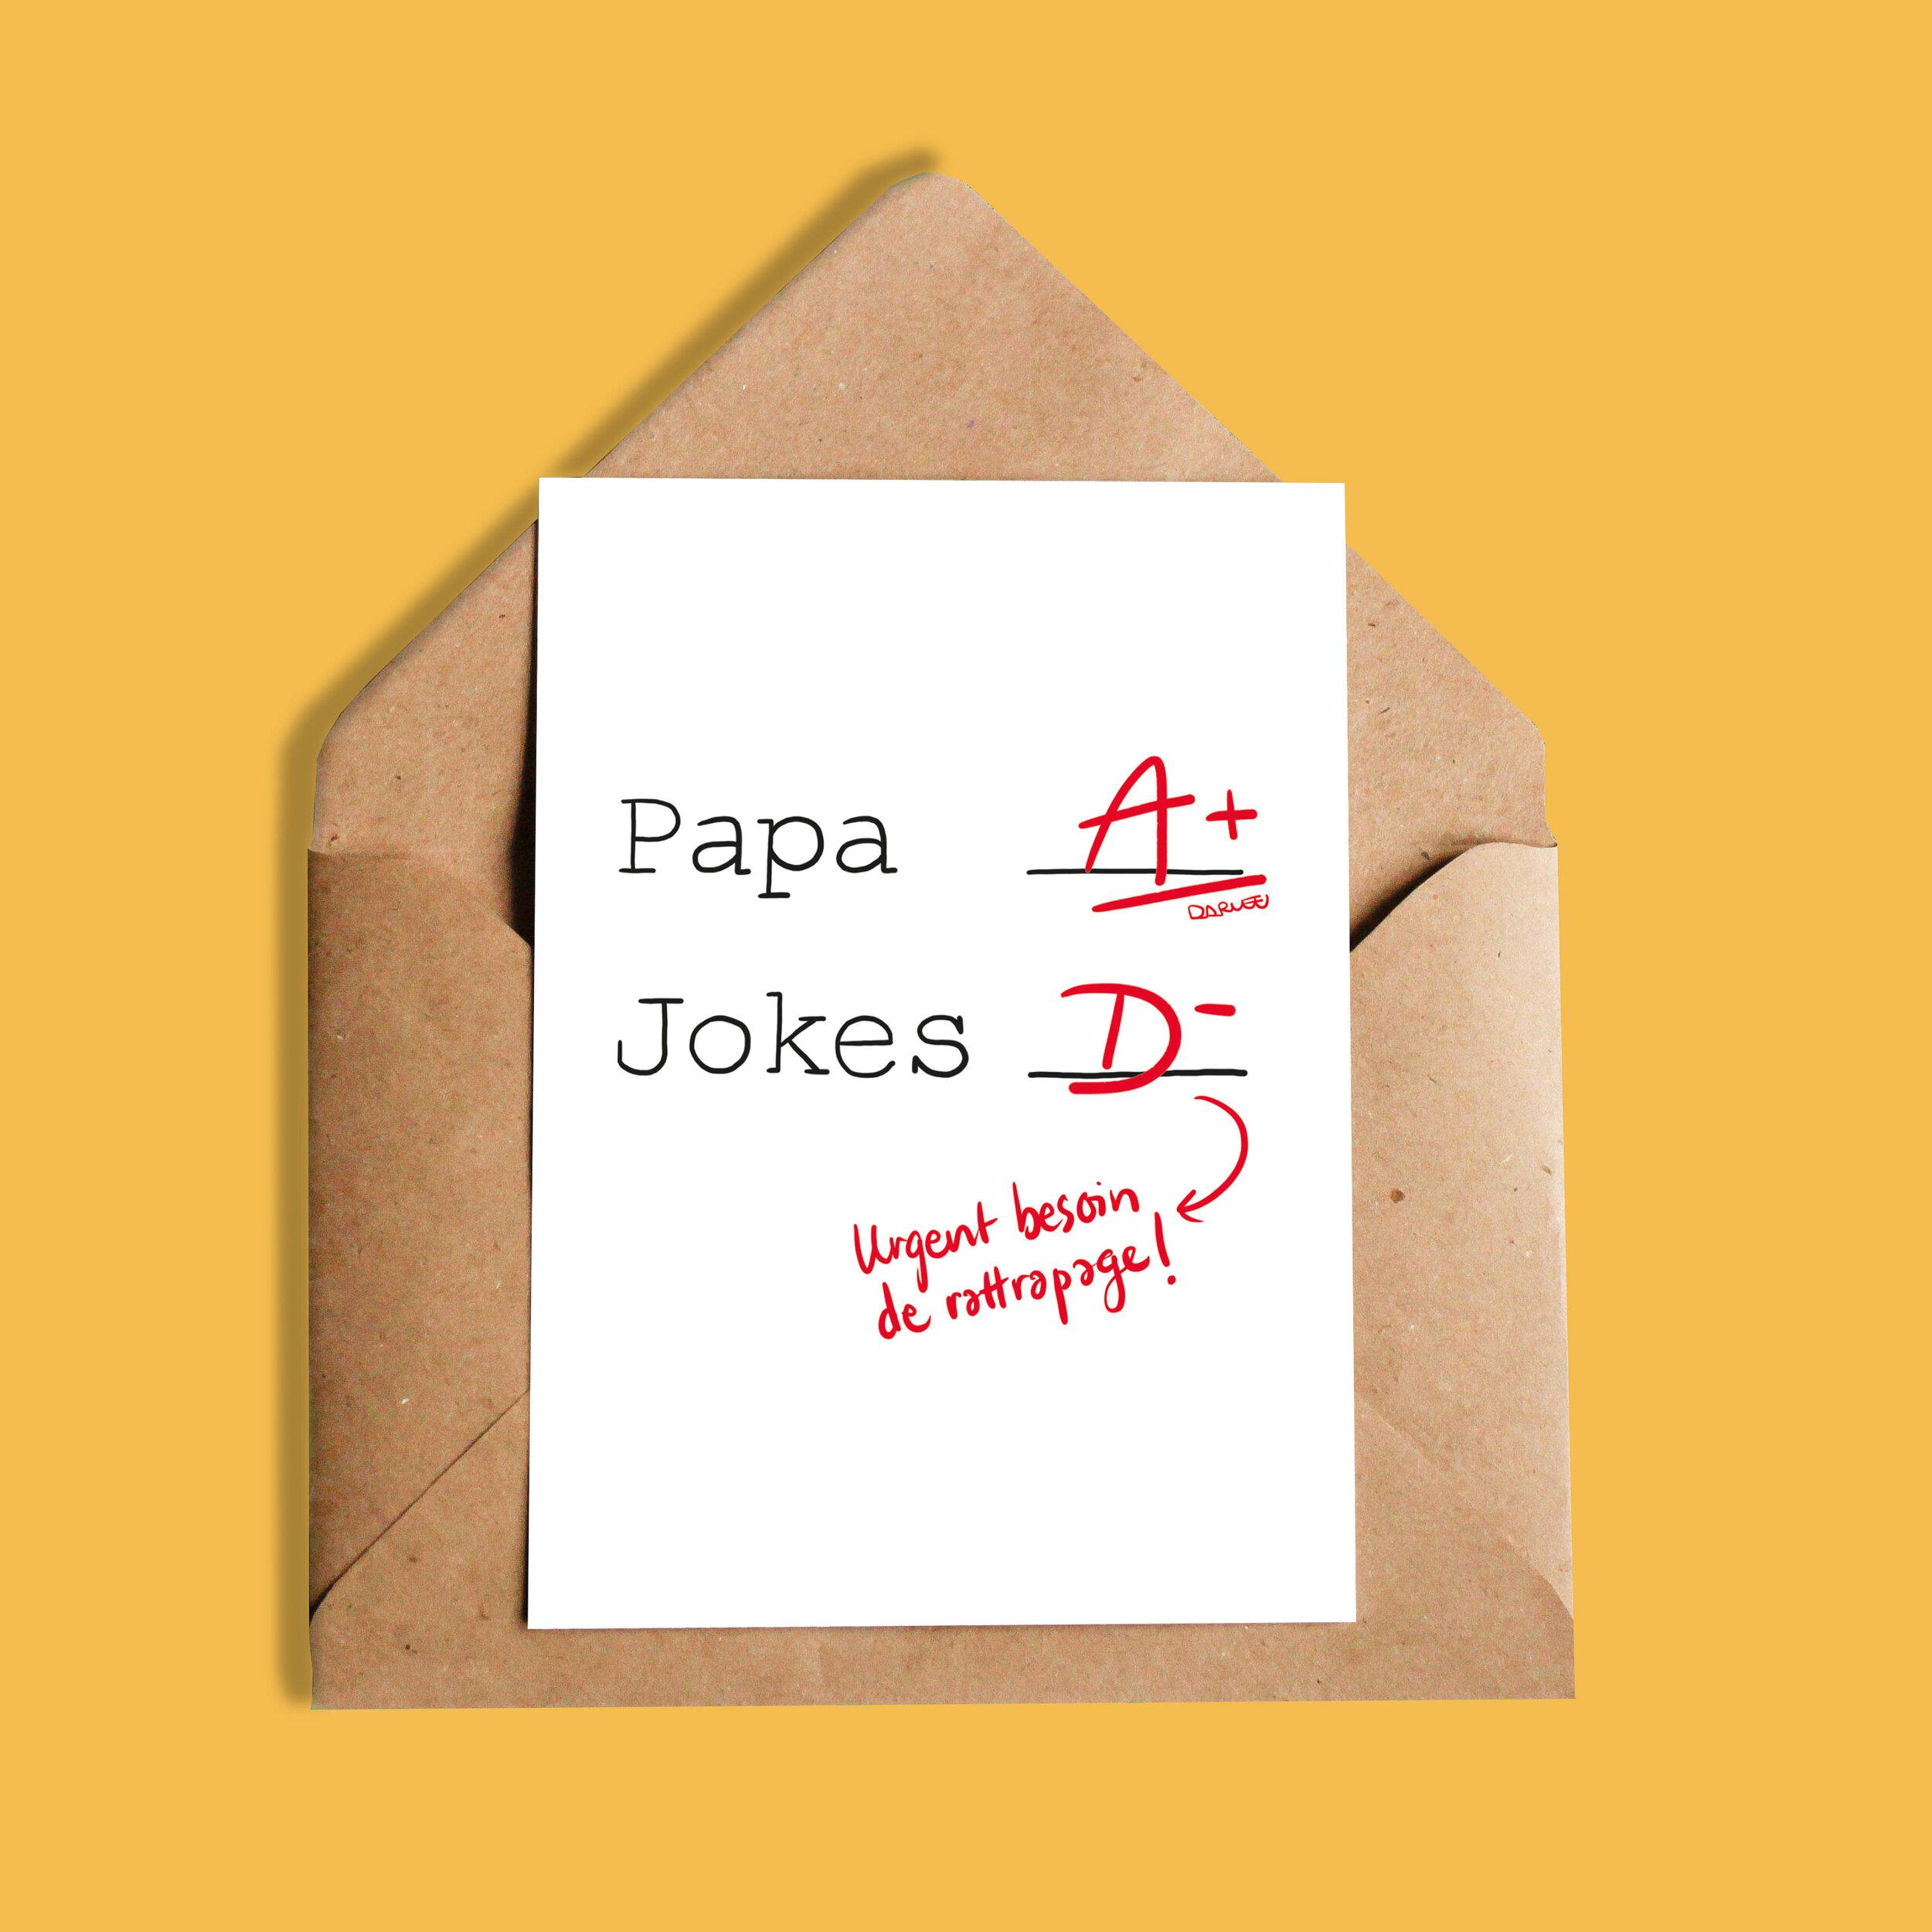 Darvee   Papa A+ Jokes D-